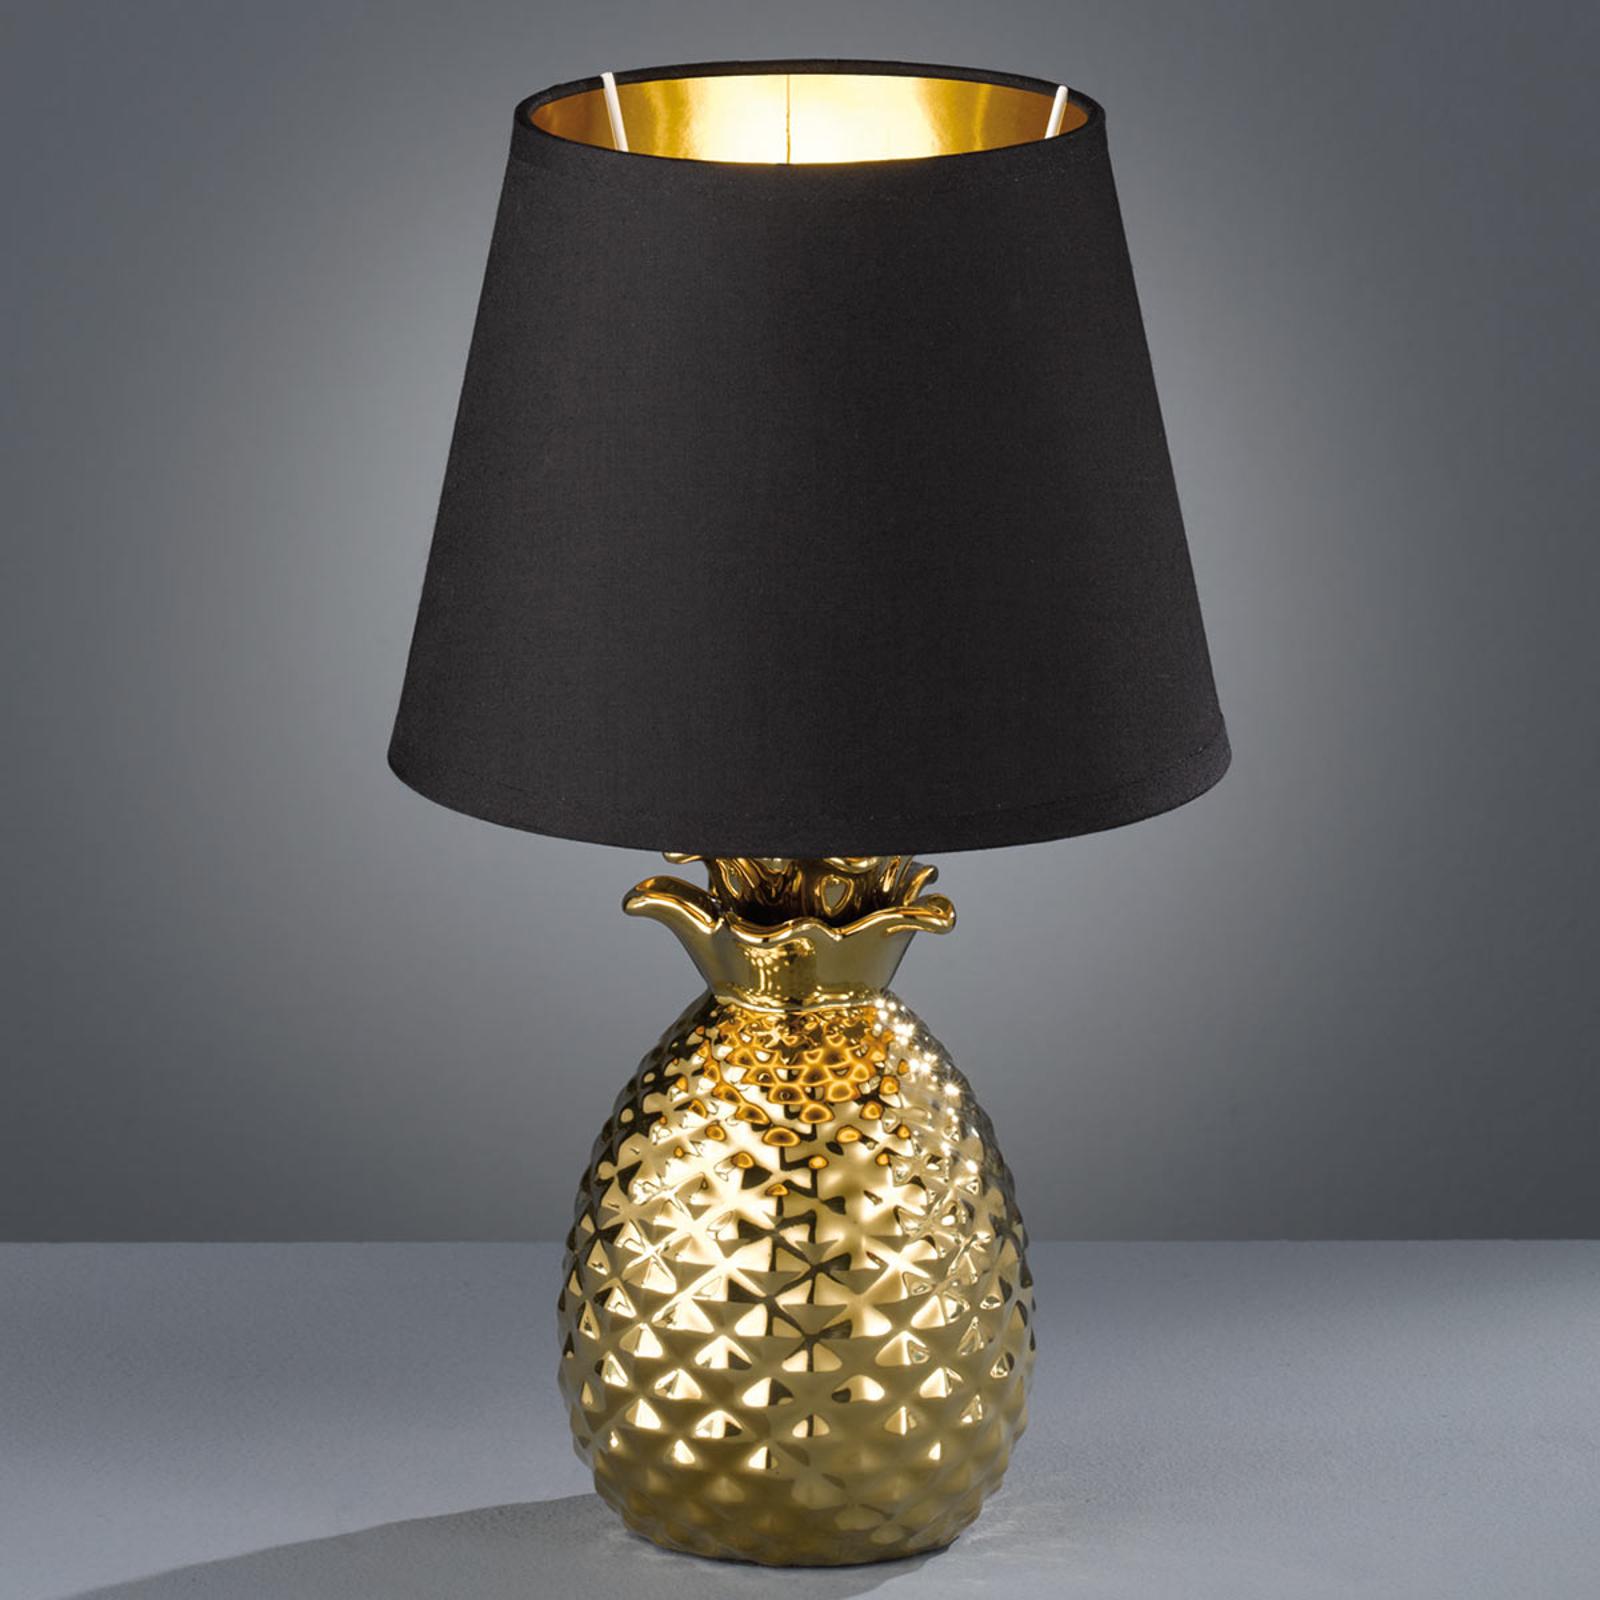 Elegante keramische tafellamp Pineapple goud-zwart